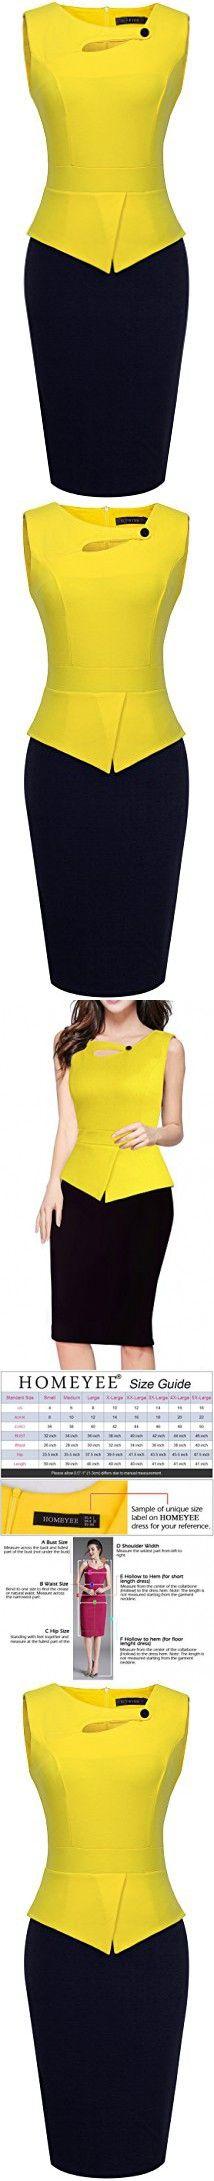 HOMEYEE Women's Elegant Chic Bodycon Formal Dress B288 (M, Yellow + Black)